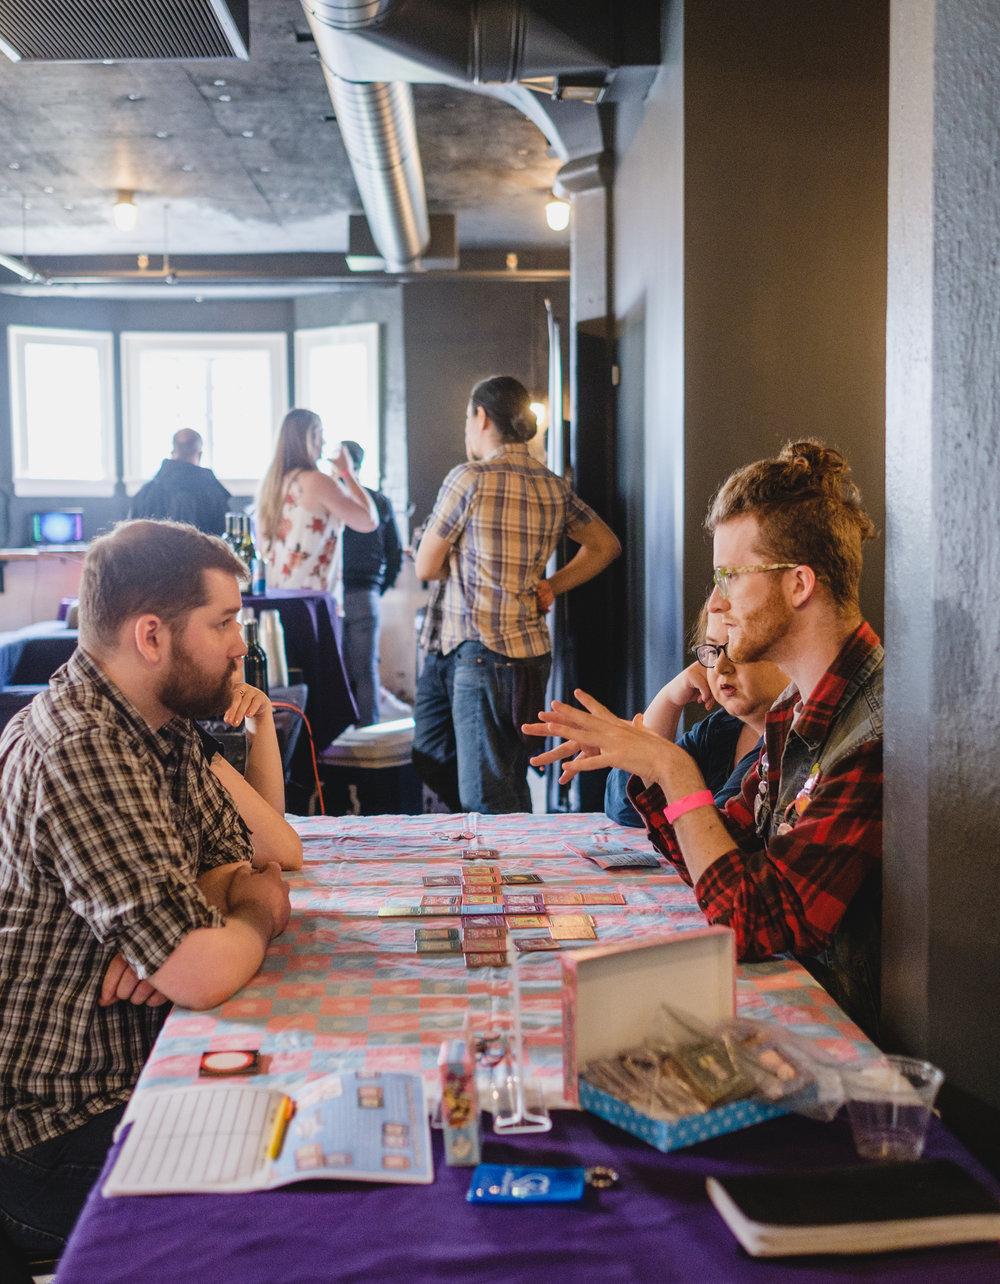 drink-n-draw--portland-indie-game-squad--patreon--design-week-portland_33957672690_o.jpg